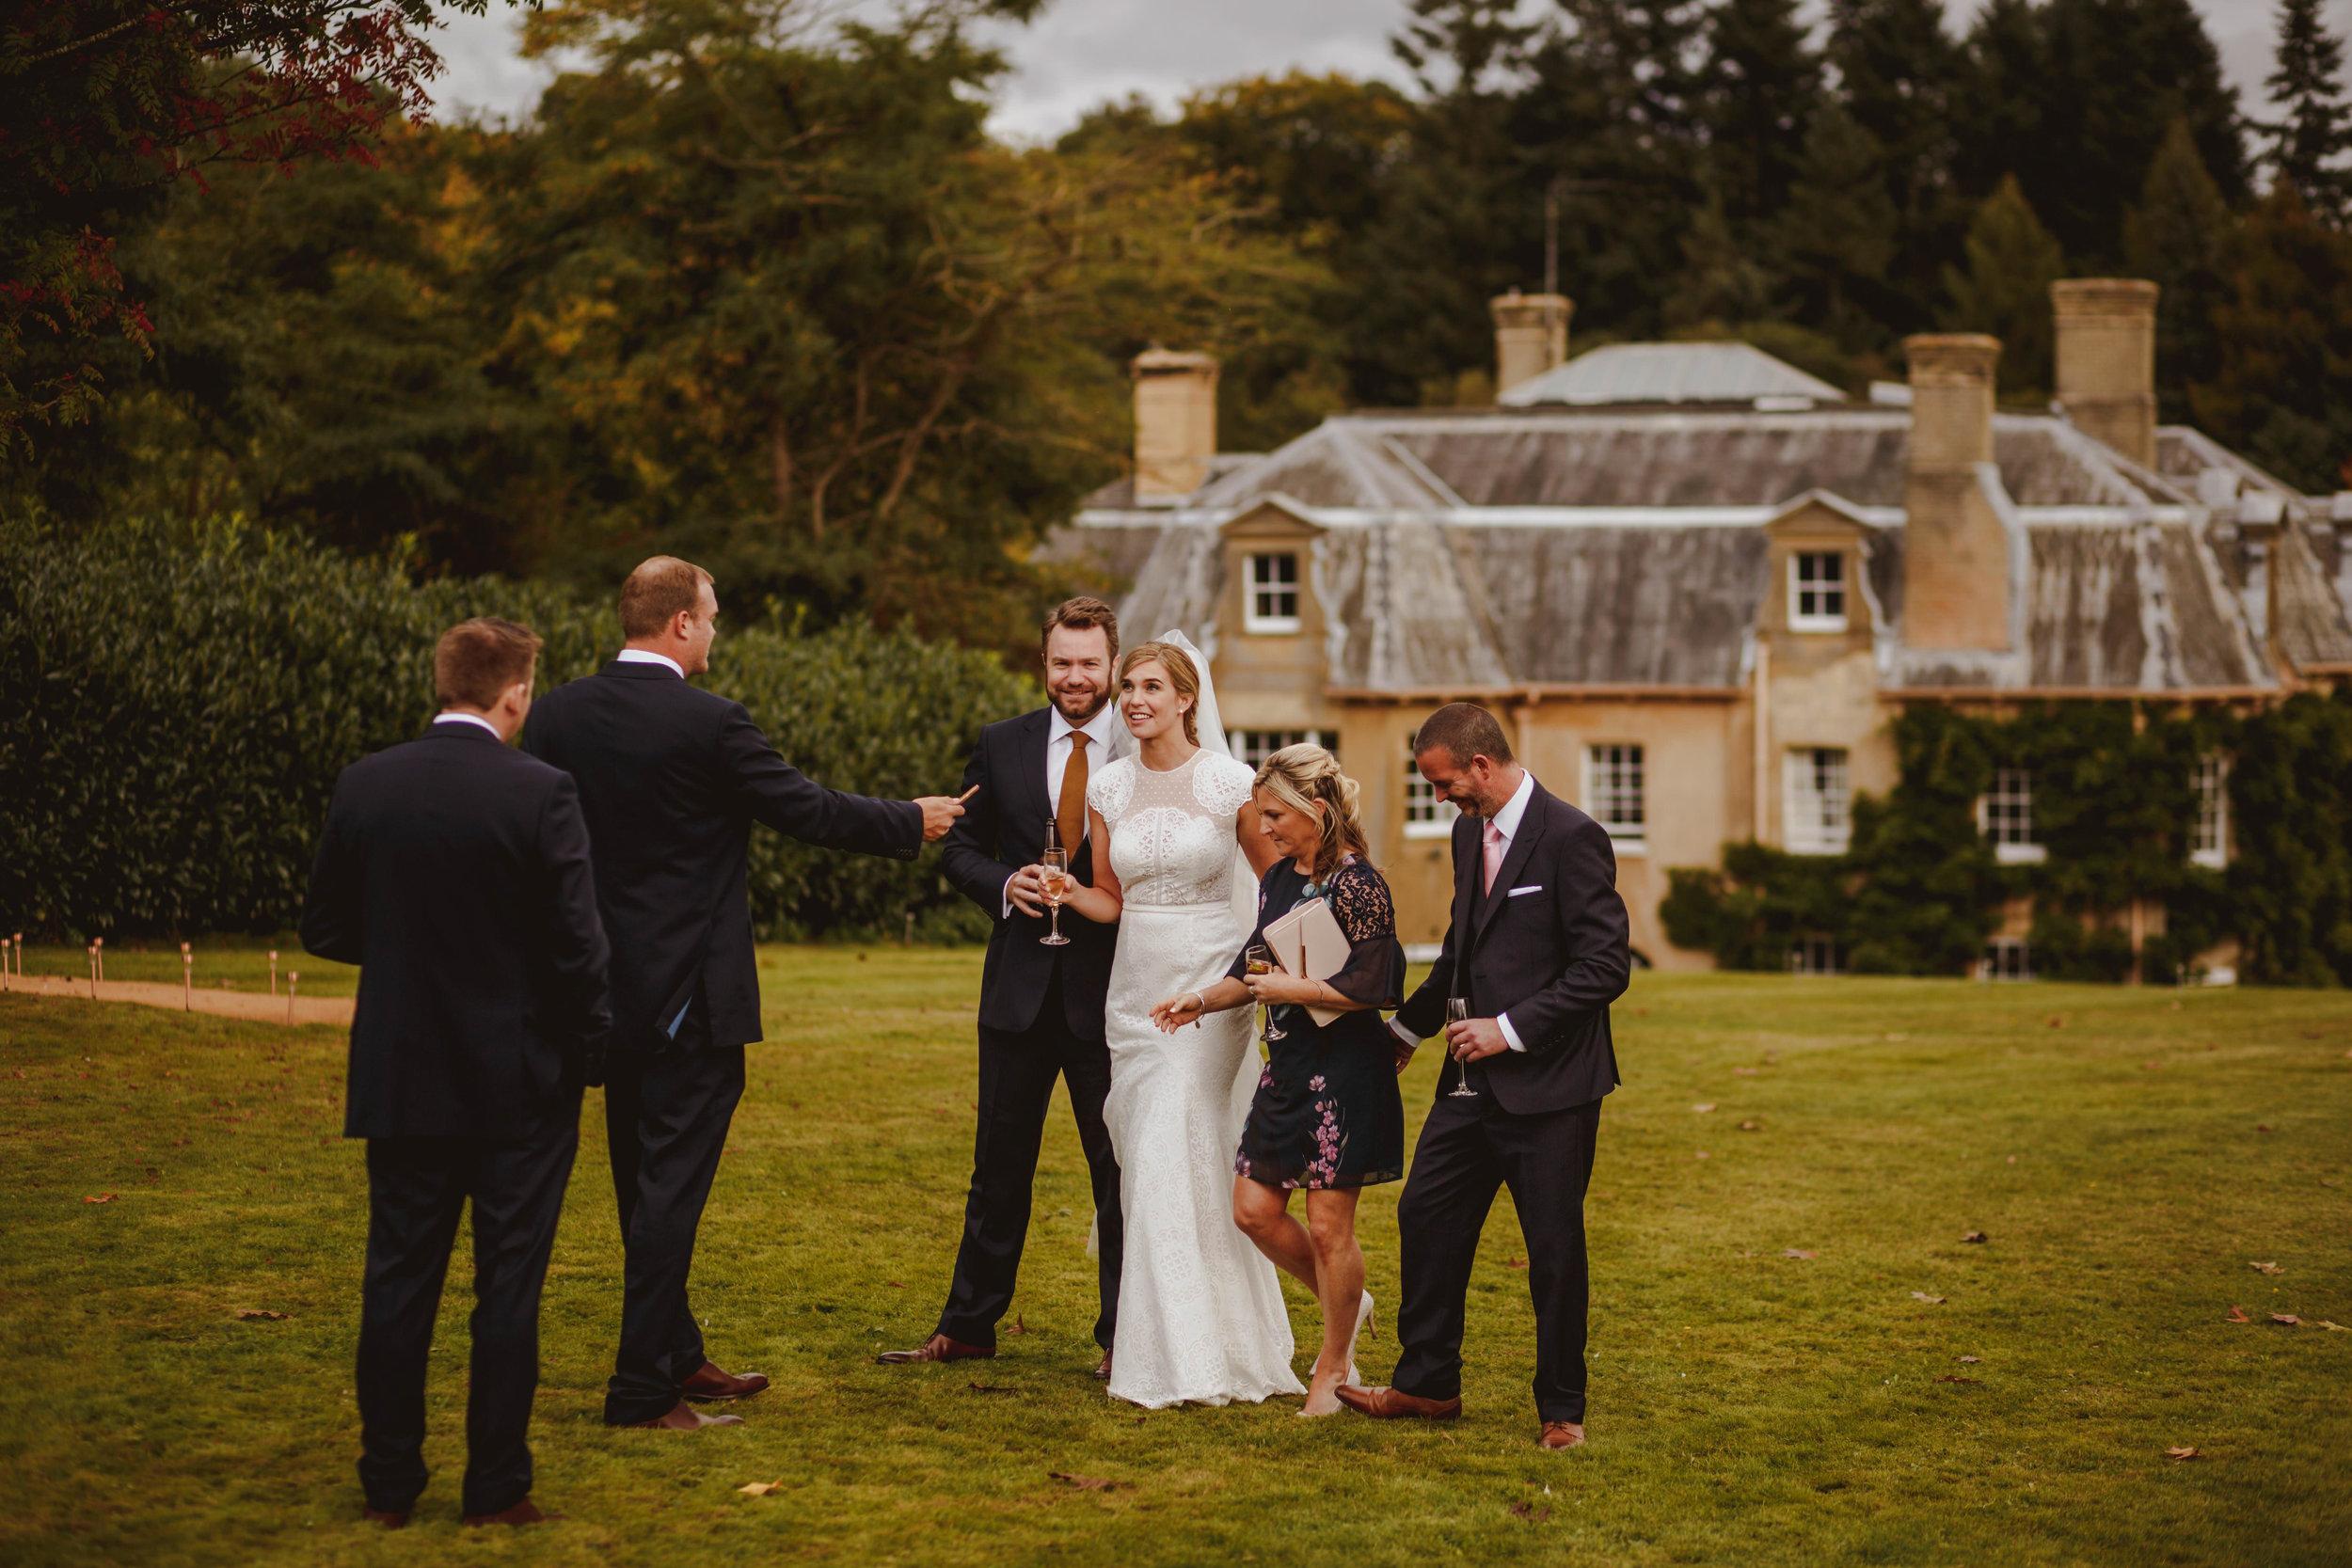 Surrey-wedding-photography-23.jpg